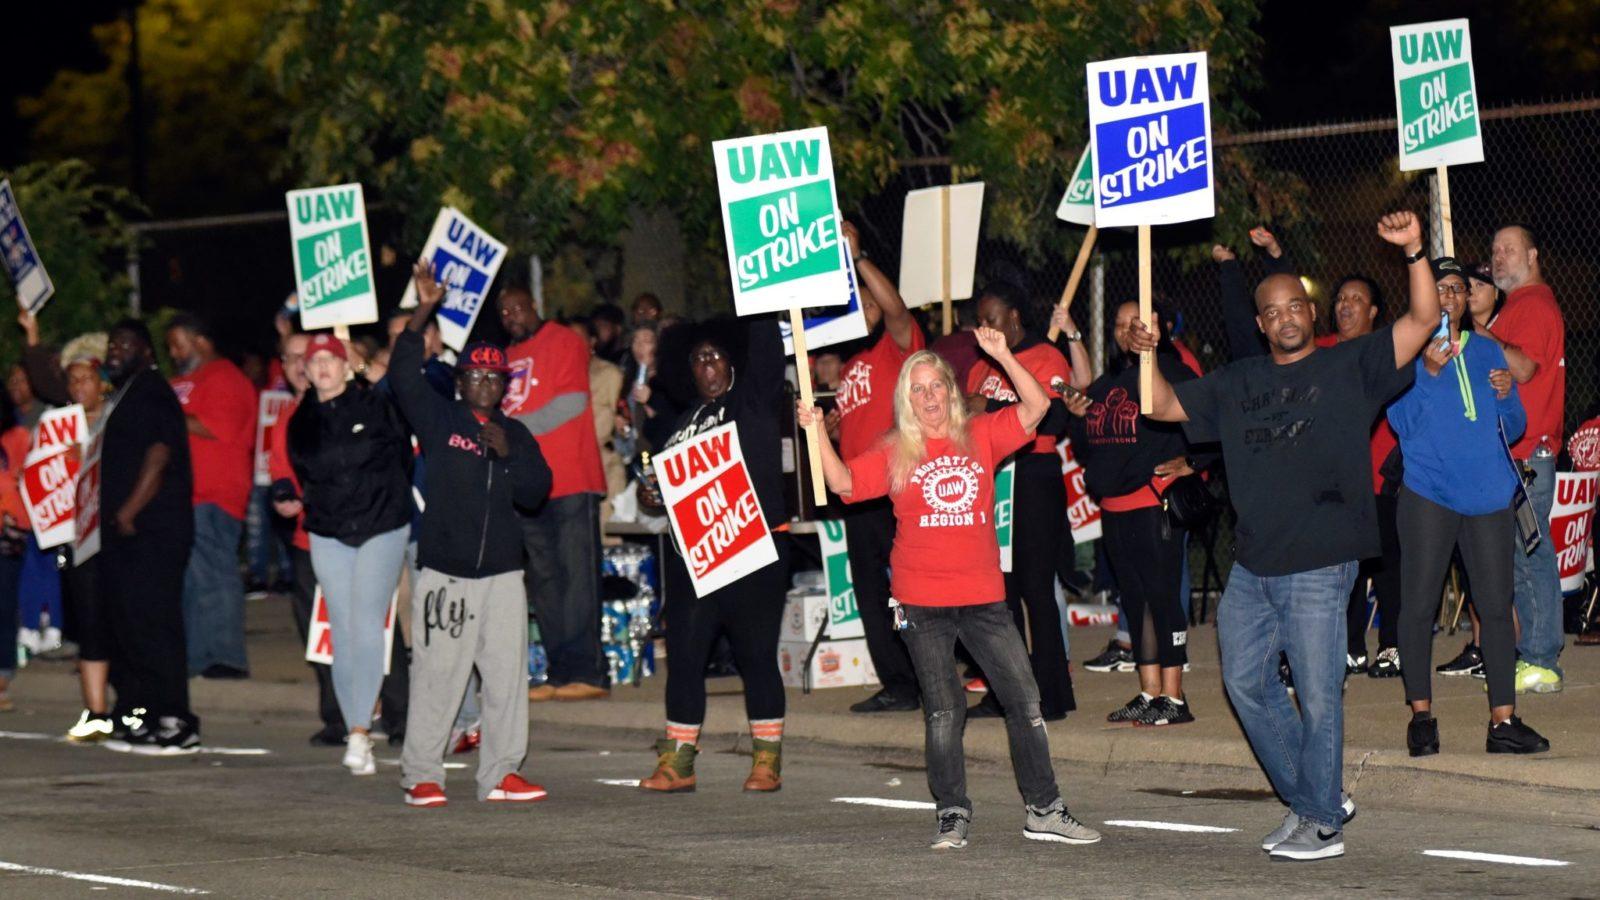 UAW Declares National Strike Against GM